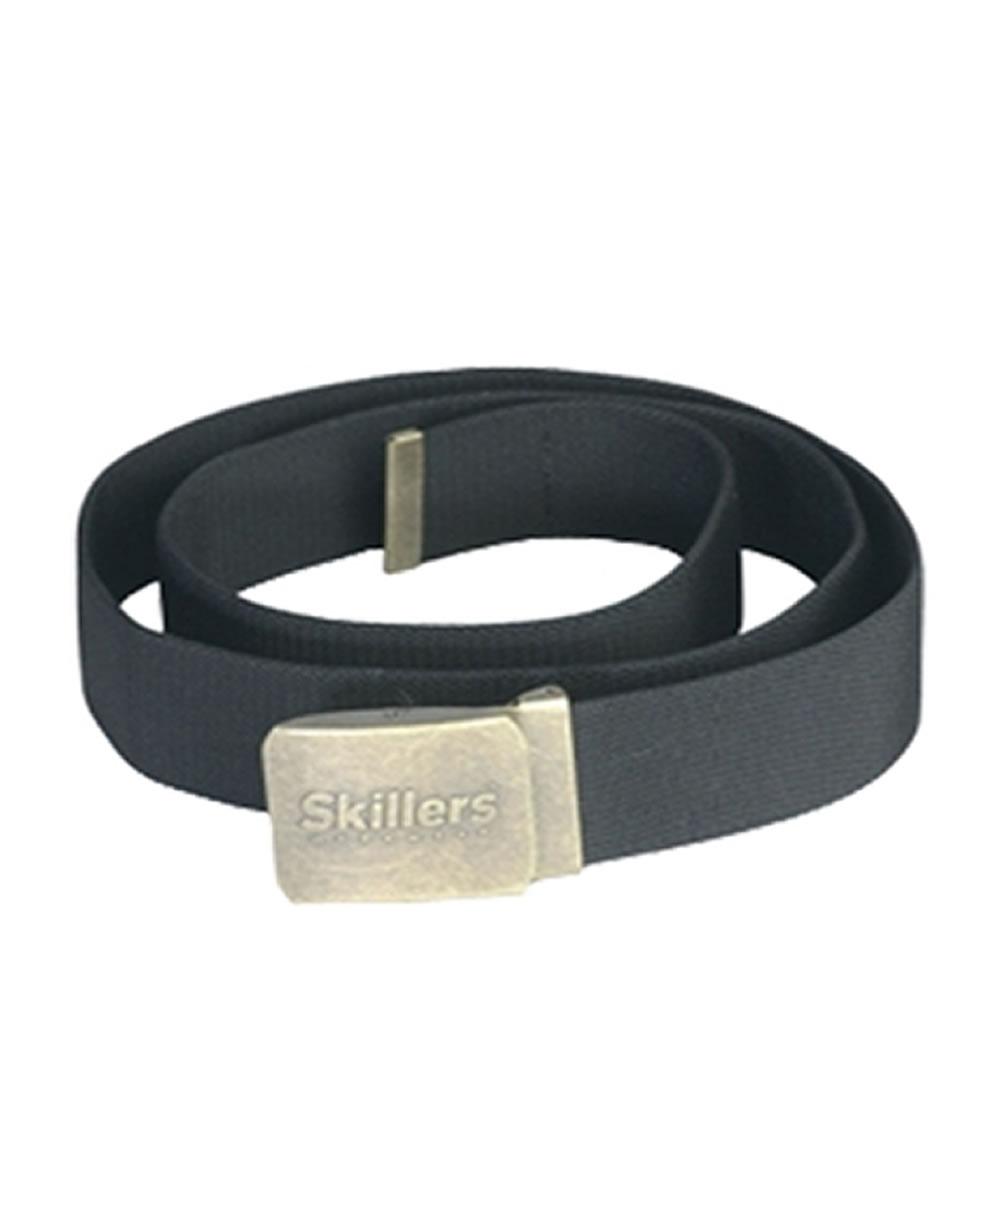 SKILLERS Elastic Belt